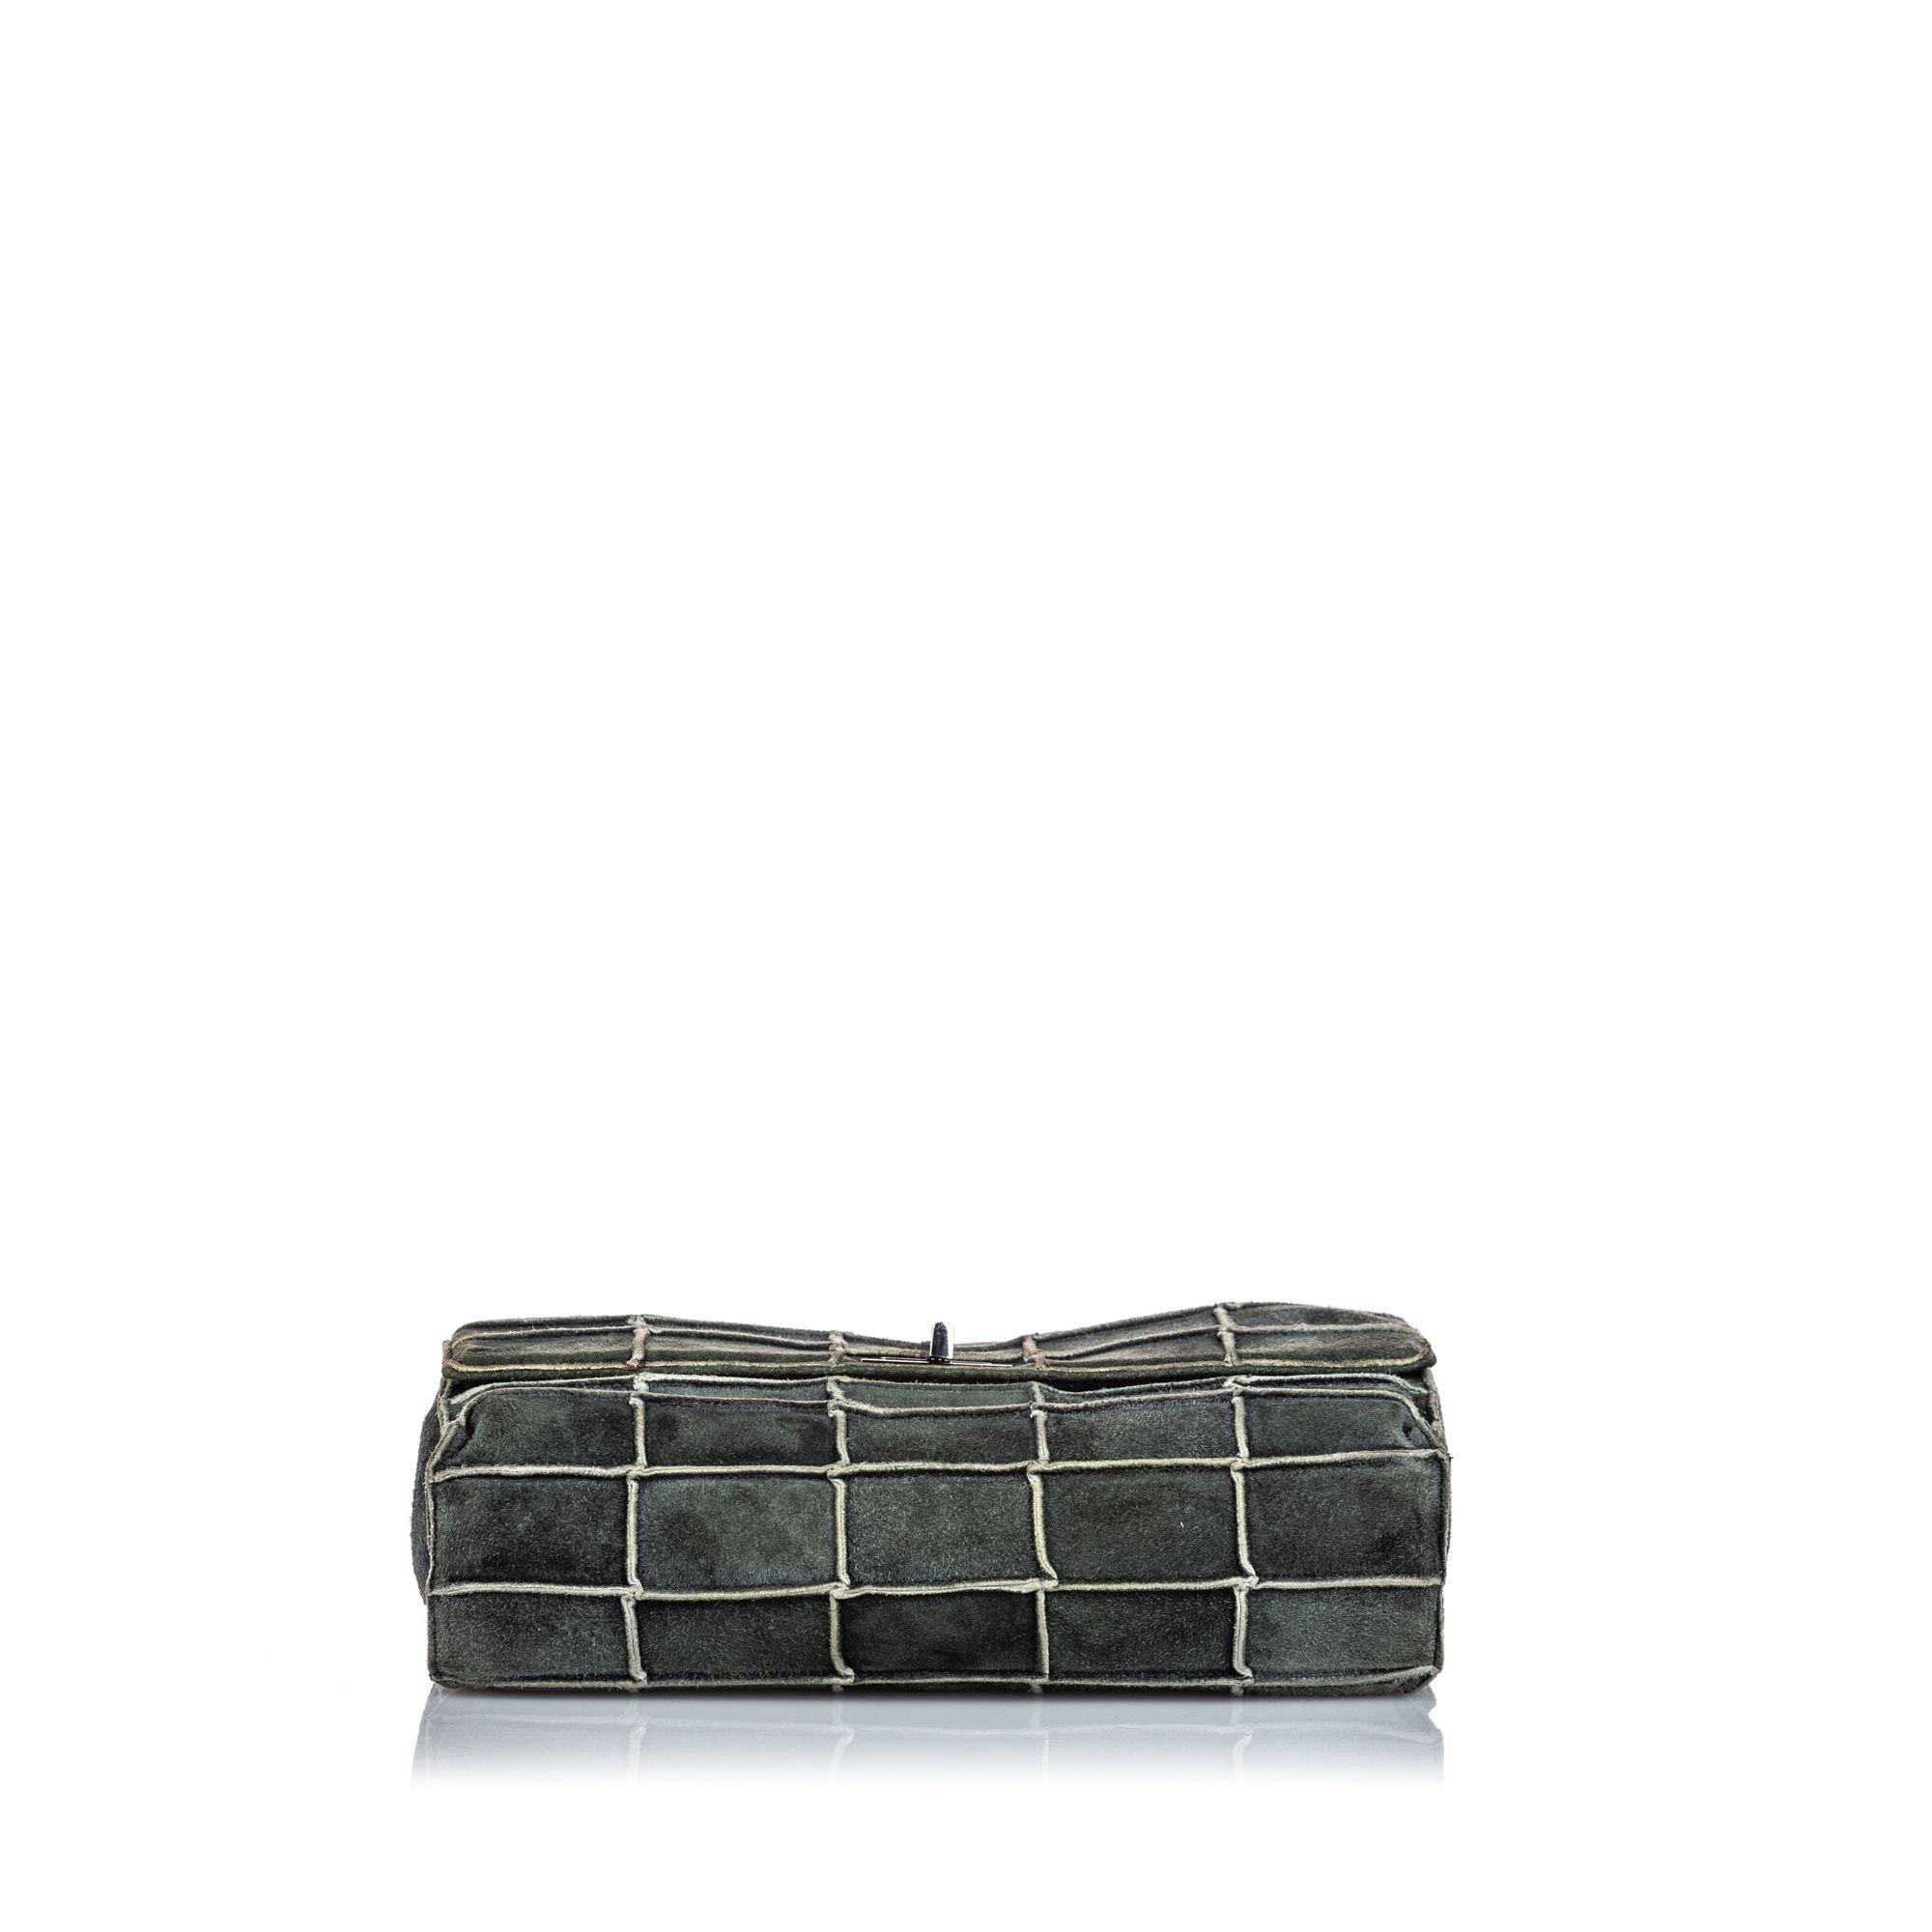 Vintage Chanel Reissue 225 Patchwork Flap Bag Gray